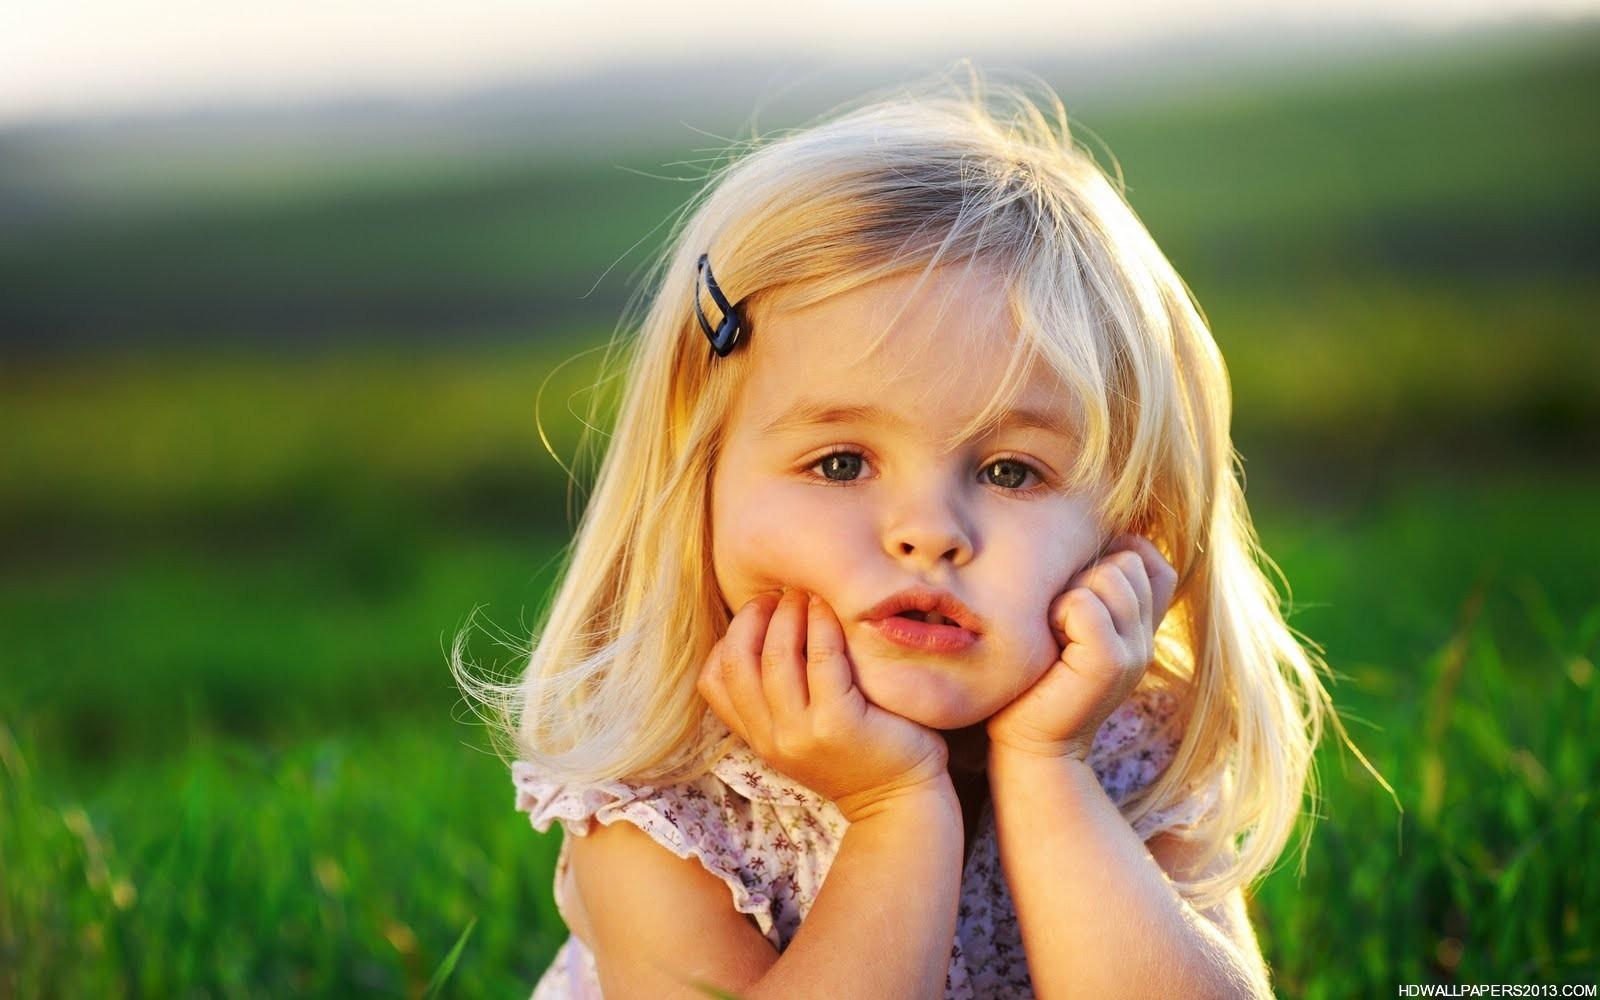 Cute Kids HD Wallpapers Cute Kids HD Background 1600x1000